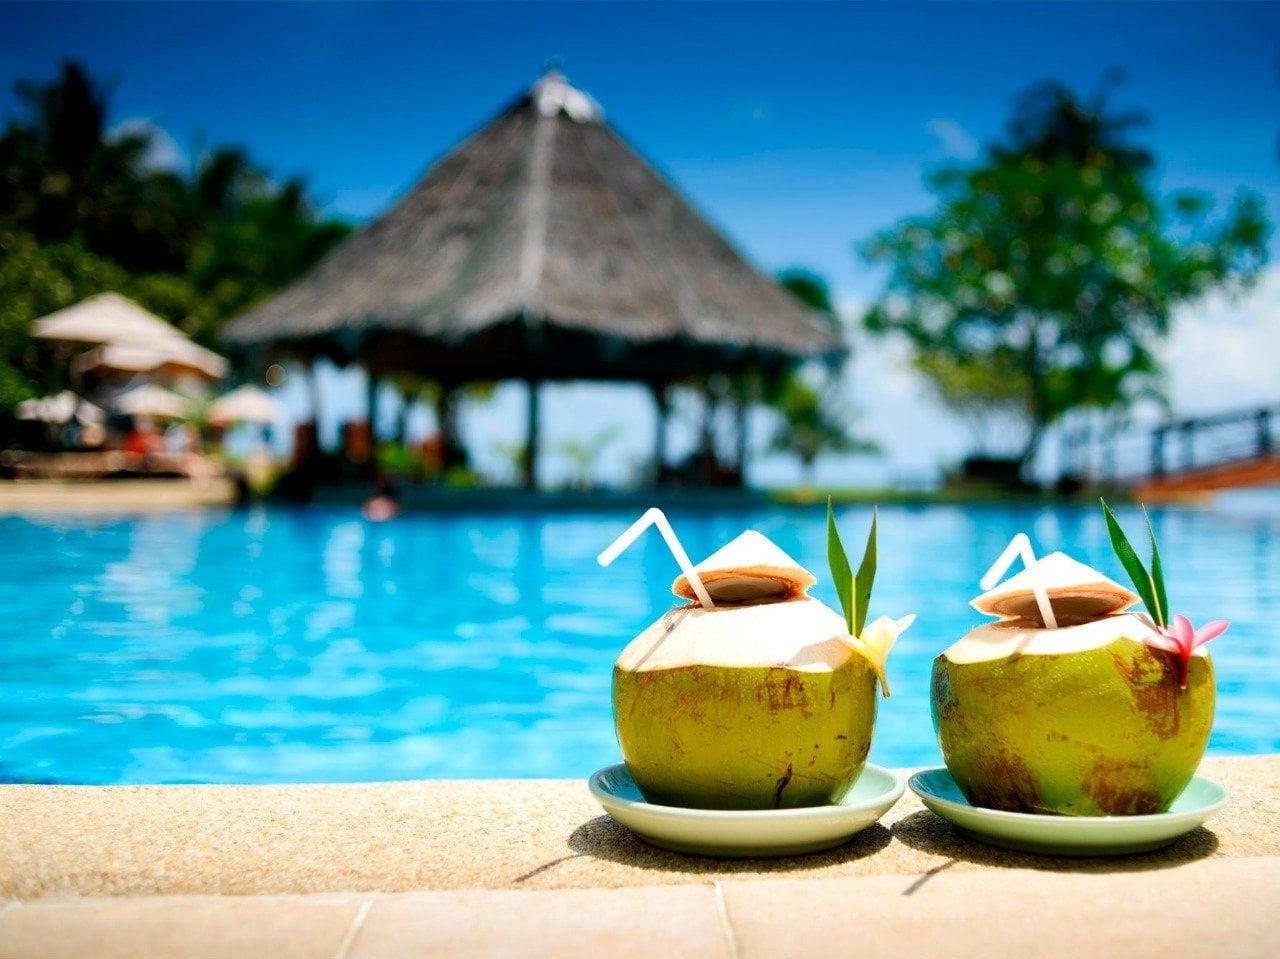 Таиланд | Топ-8 дешевых стран для жаркой зимовки | Brain Berries